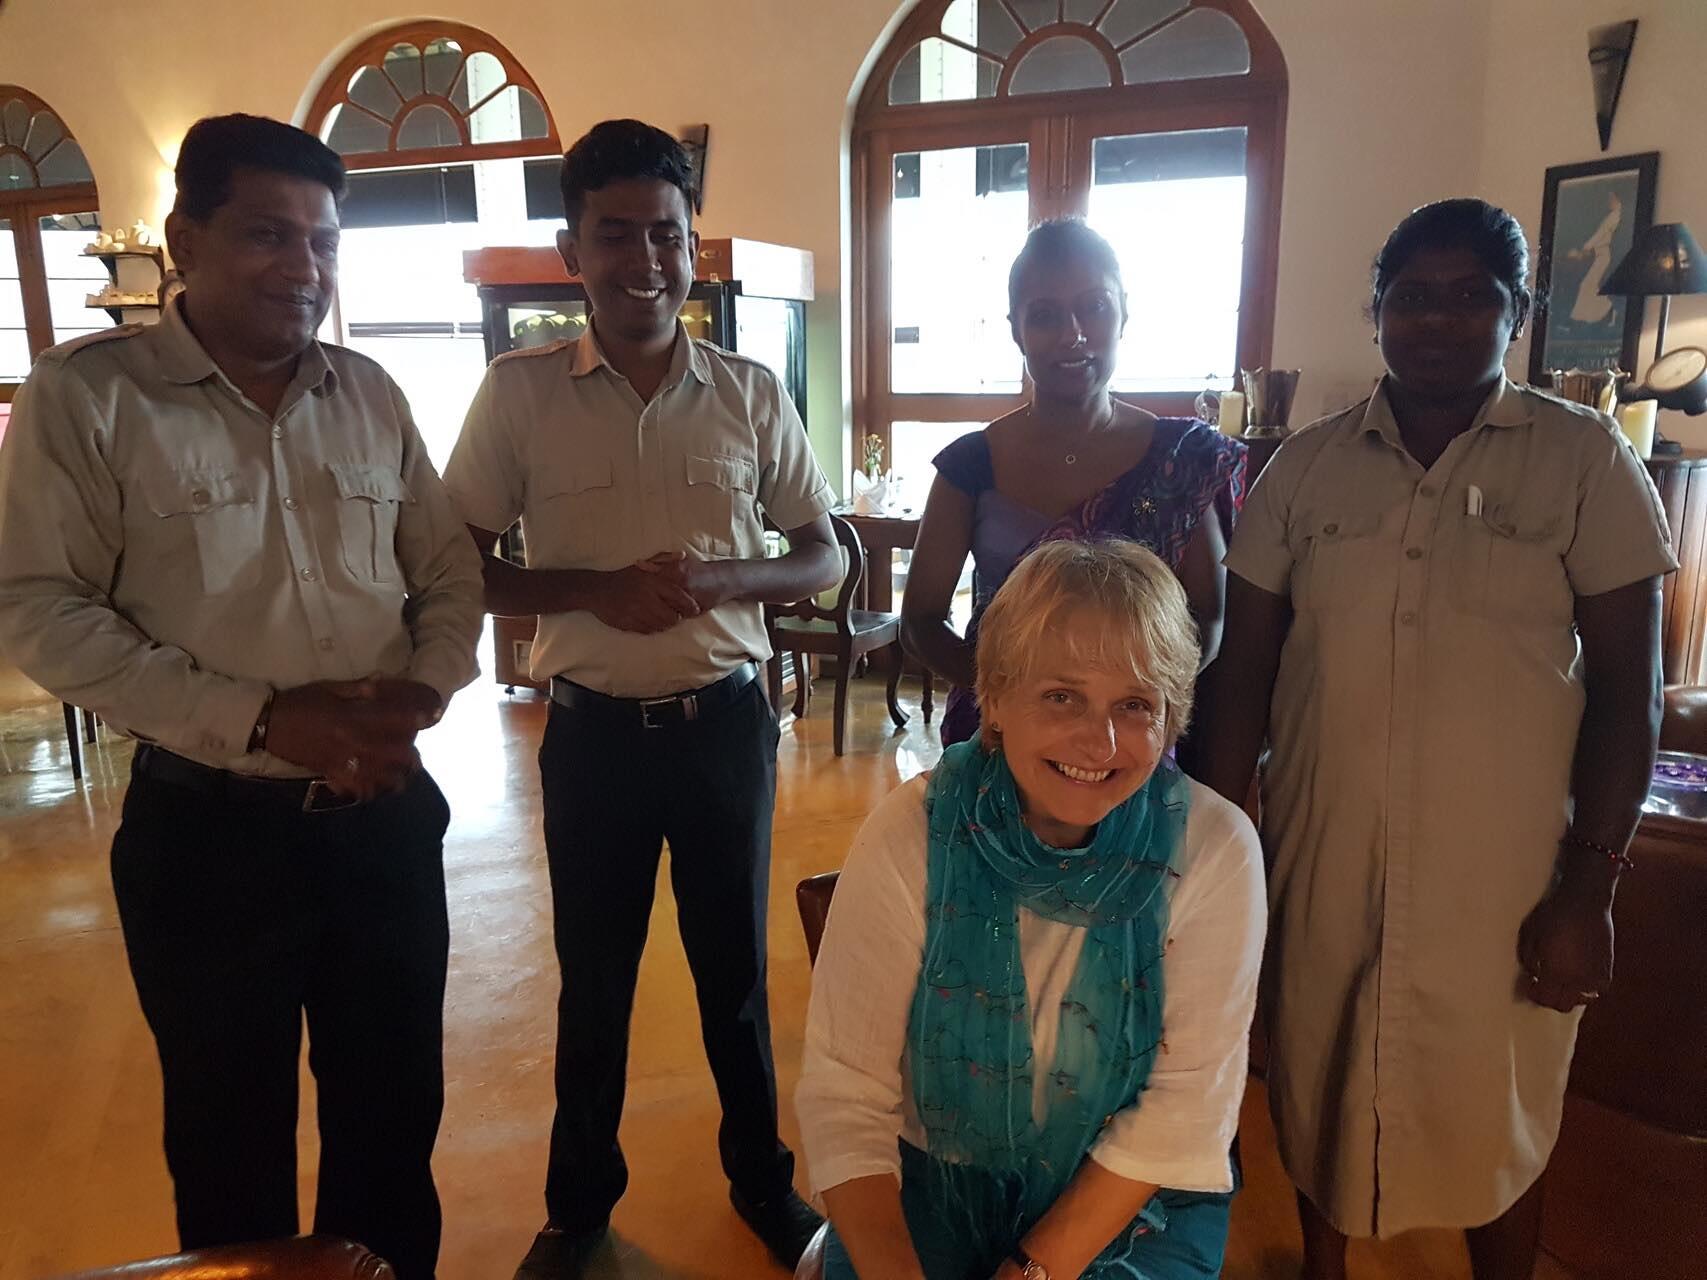 sri-lanka-madulkelle-eco-lodge-birthday-holiday-review-feedback-invite-to-paradise-quentin-kate-hulm.jpg